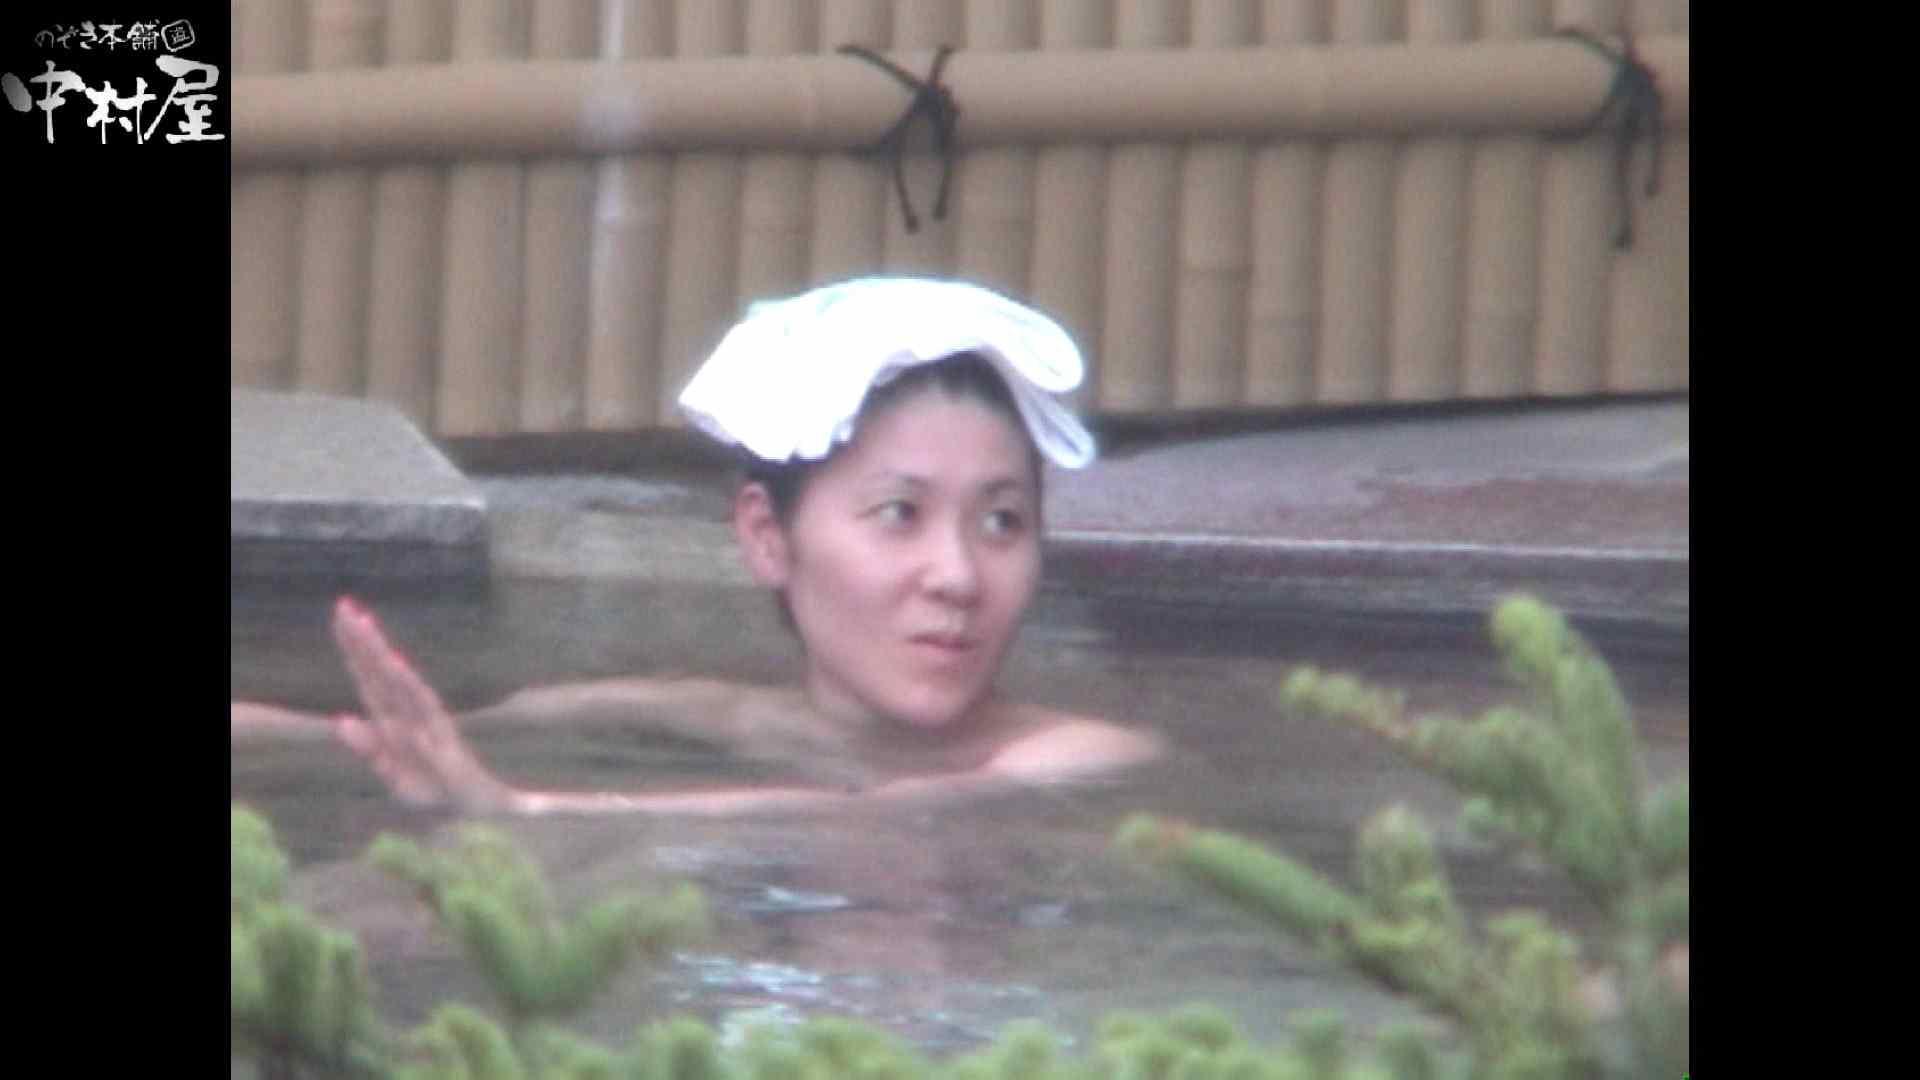 Aquaな露天風呂Vol.925 盗撮   HなOL  104pic 99